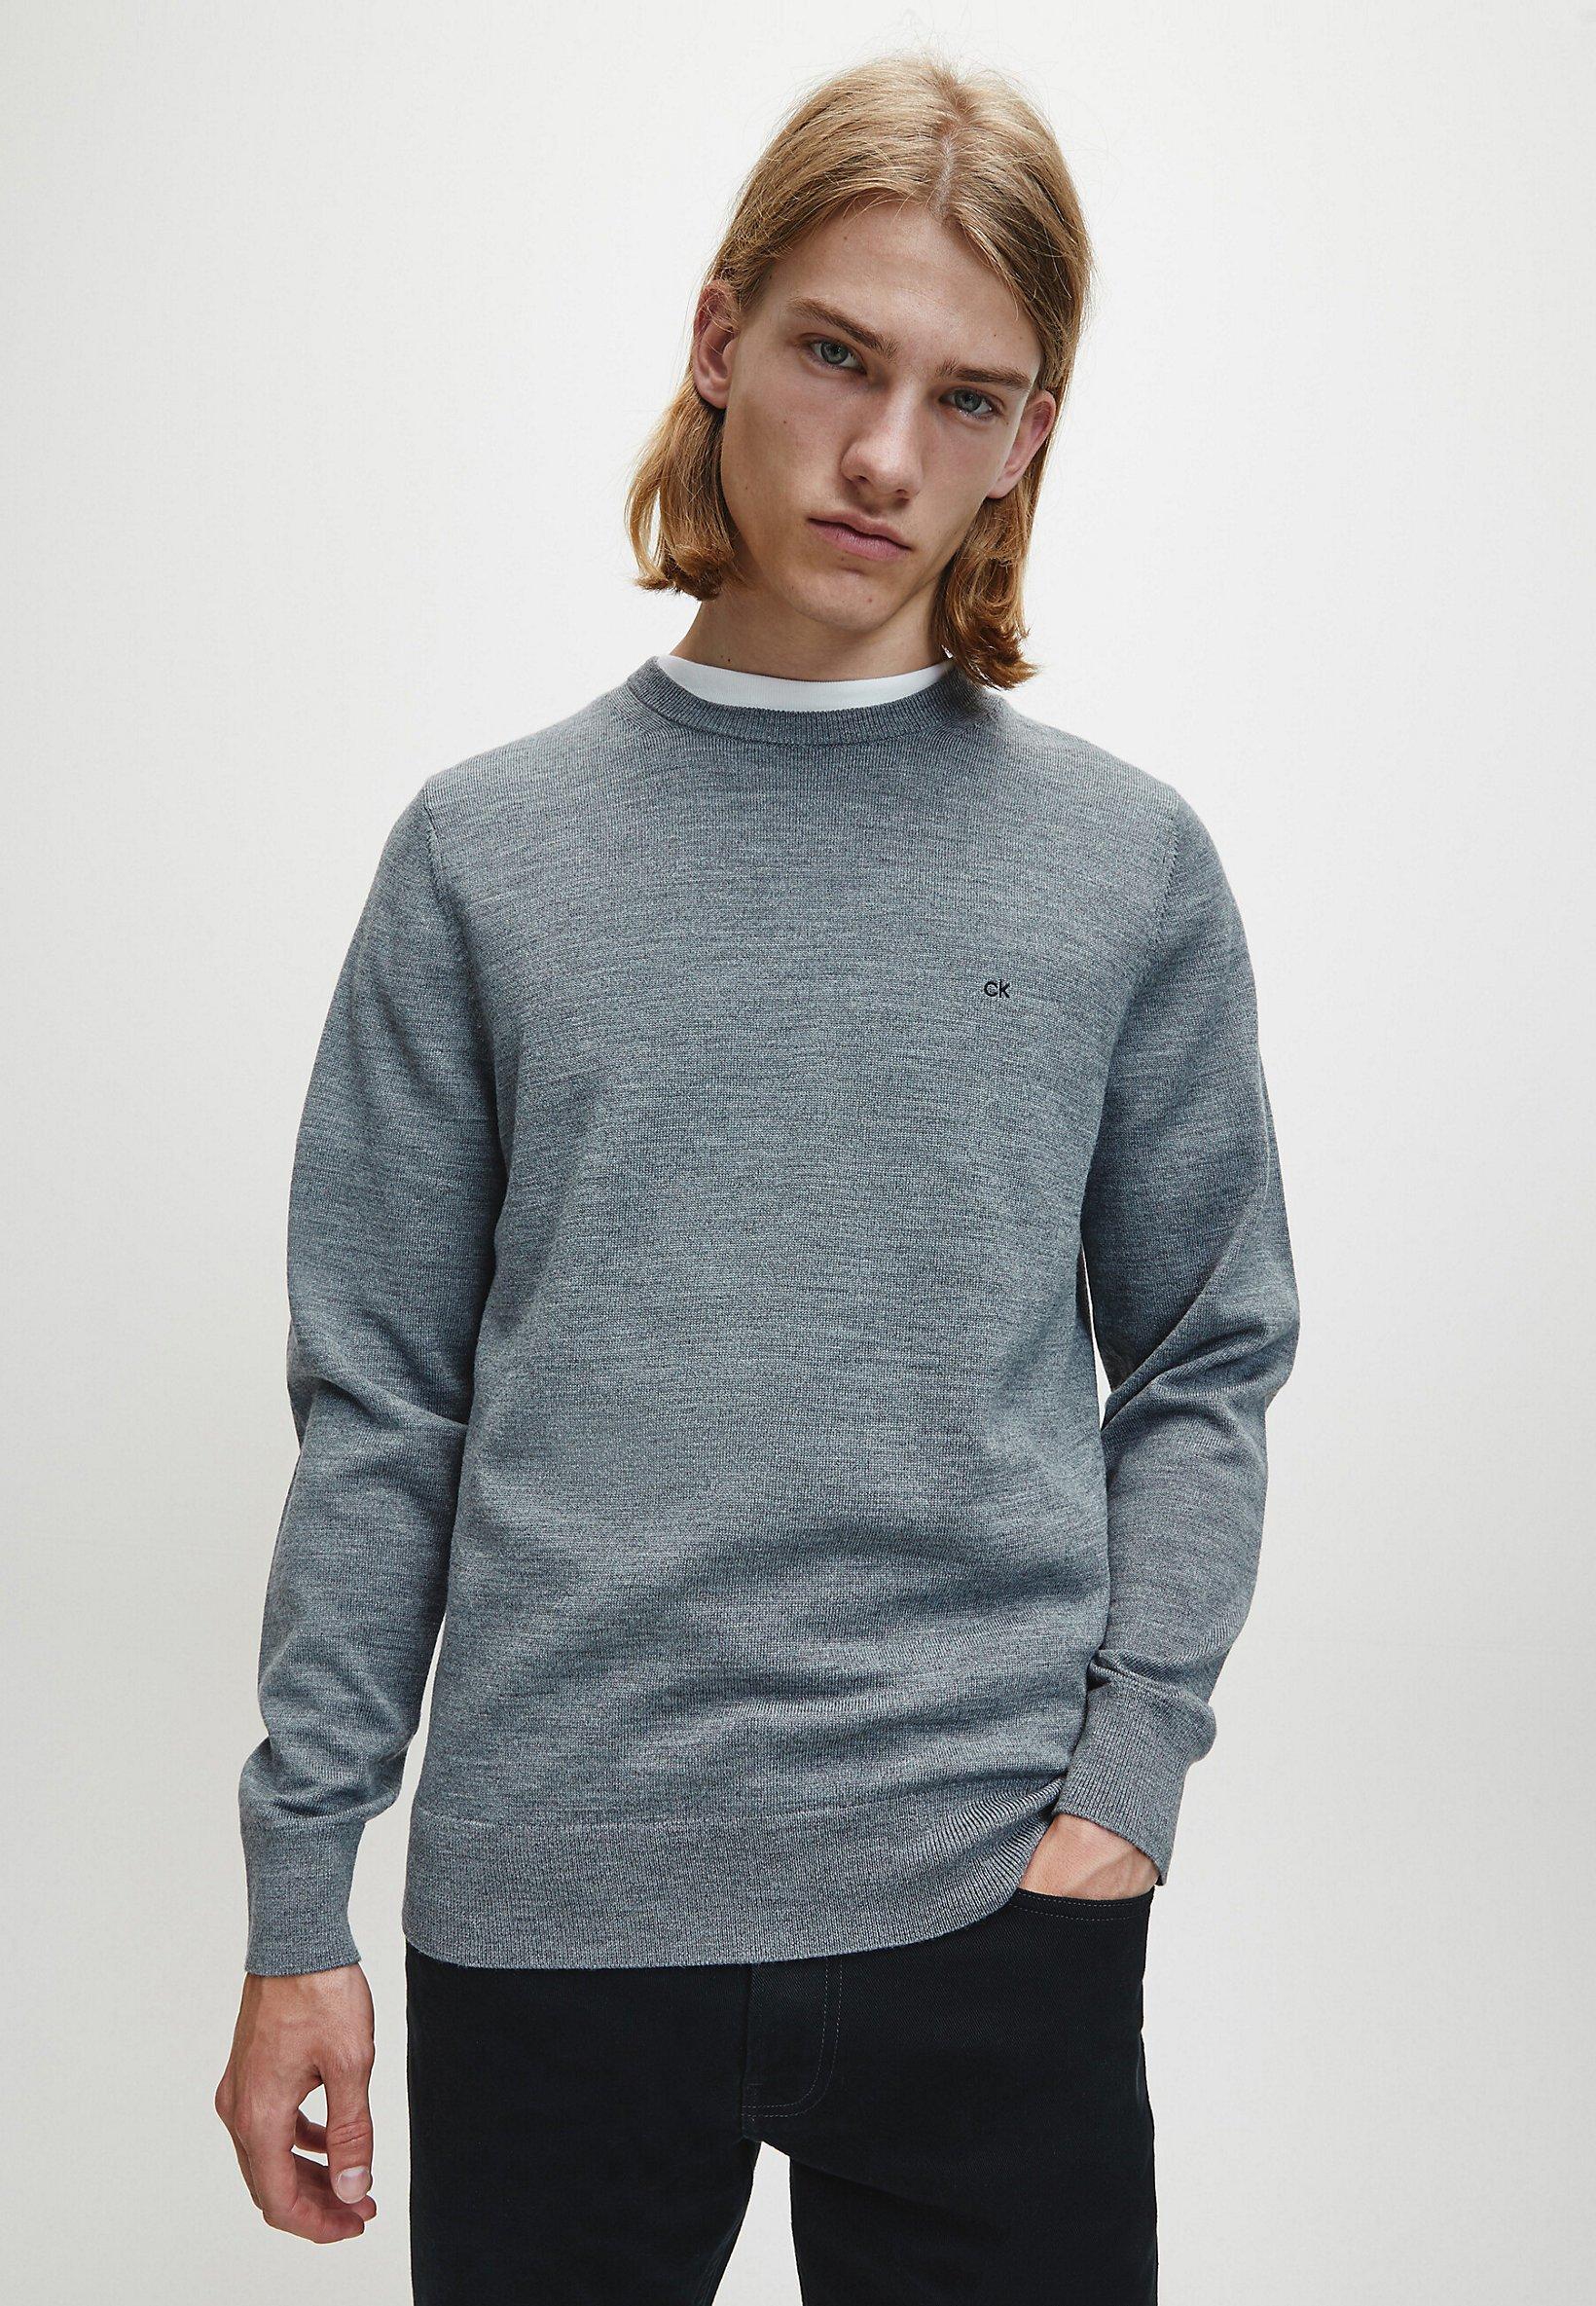 Homme SUPERIOR CREW NECK SWEATER - Pullover